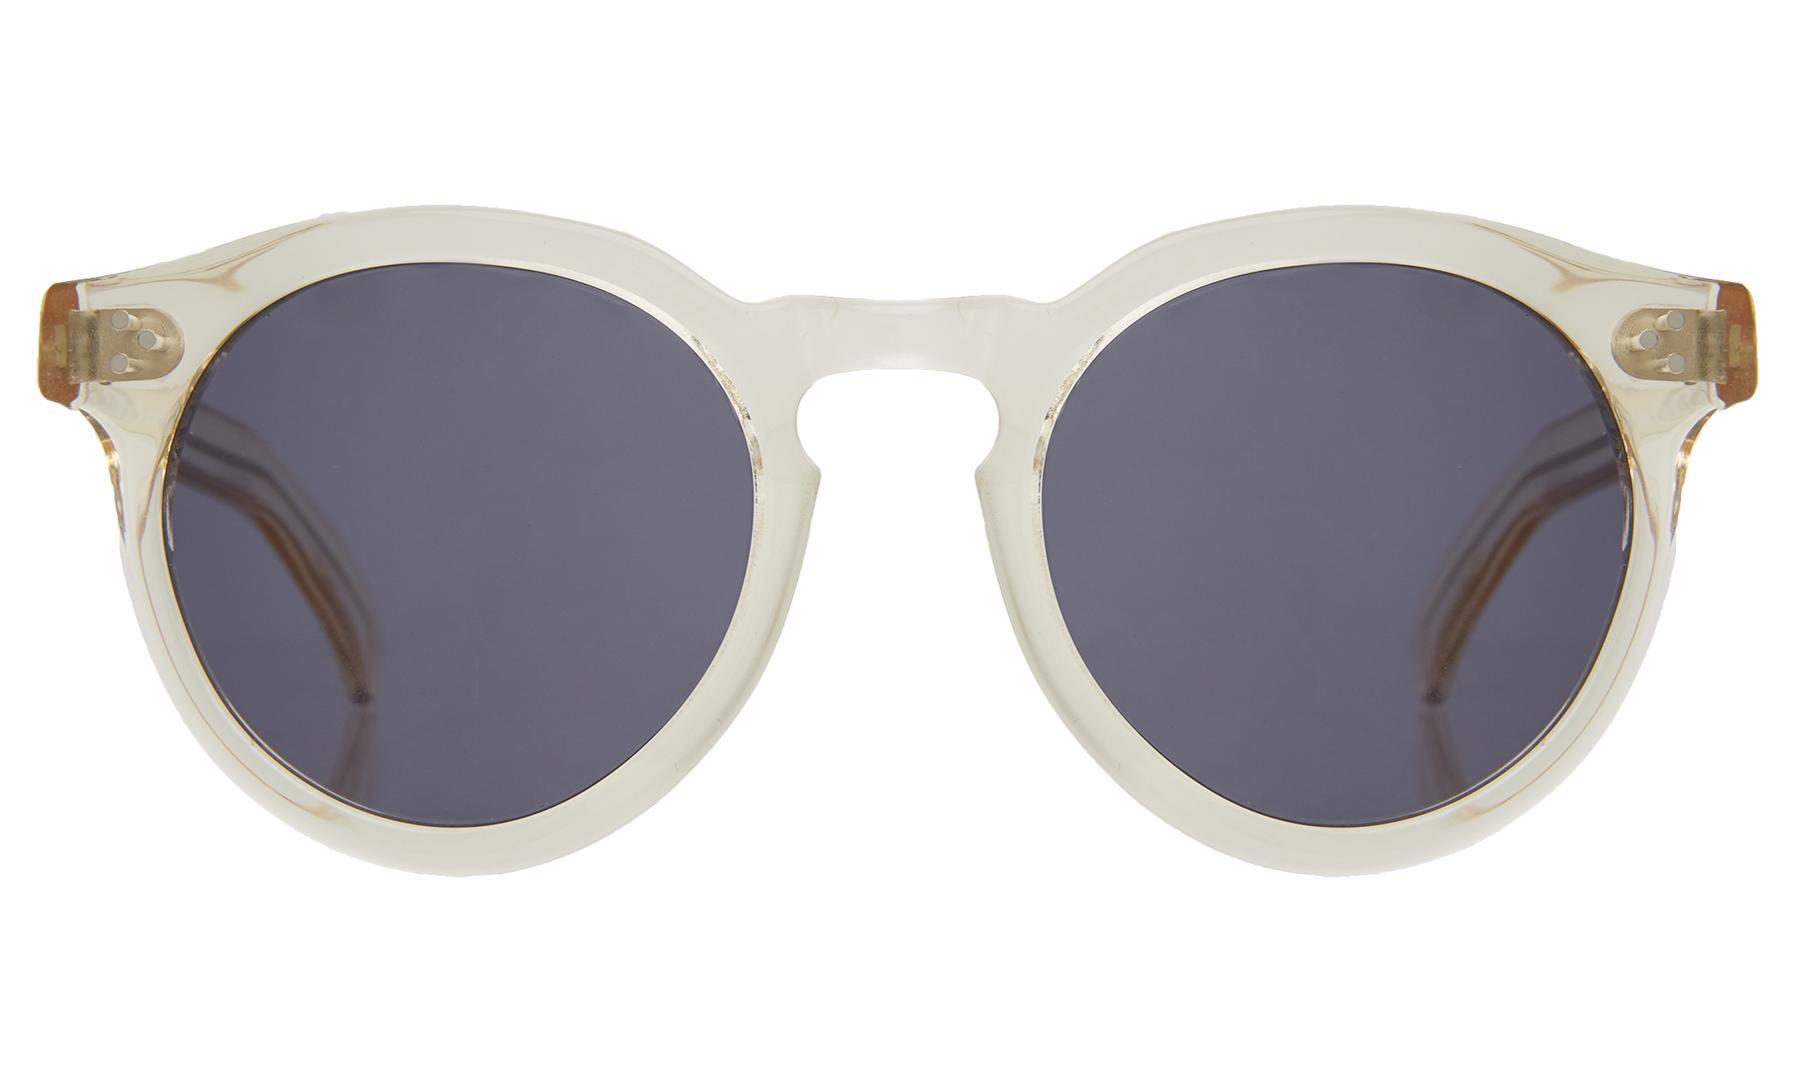 bd6e739ddc2 Illesteva. Women s Leonard Ii Sunglasses